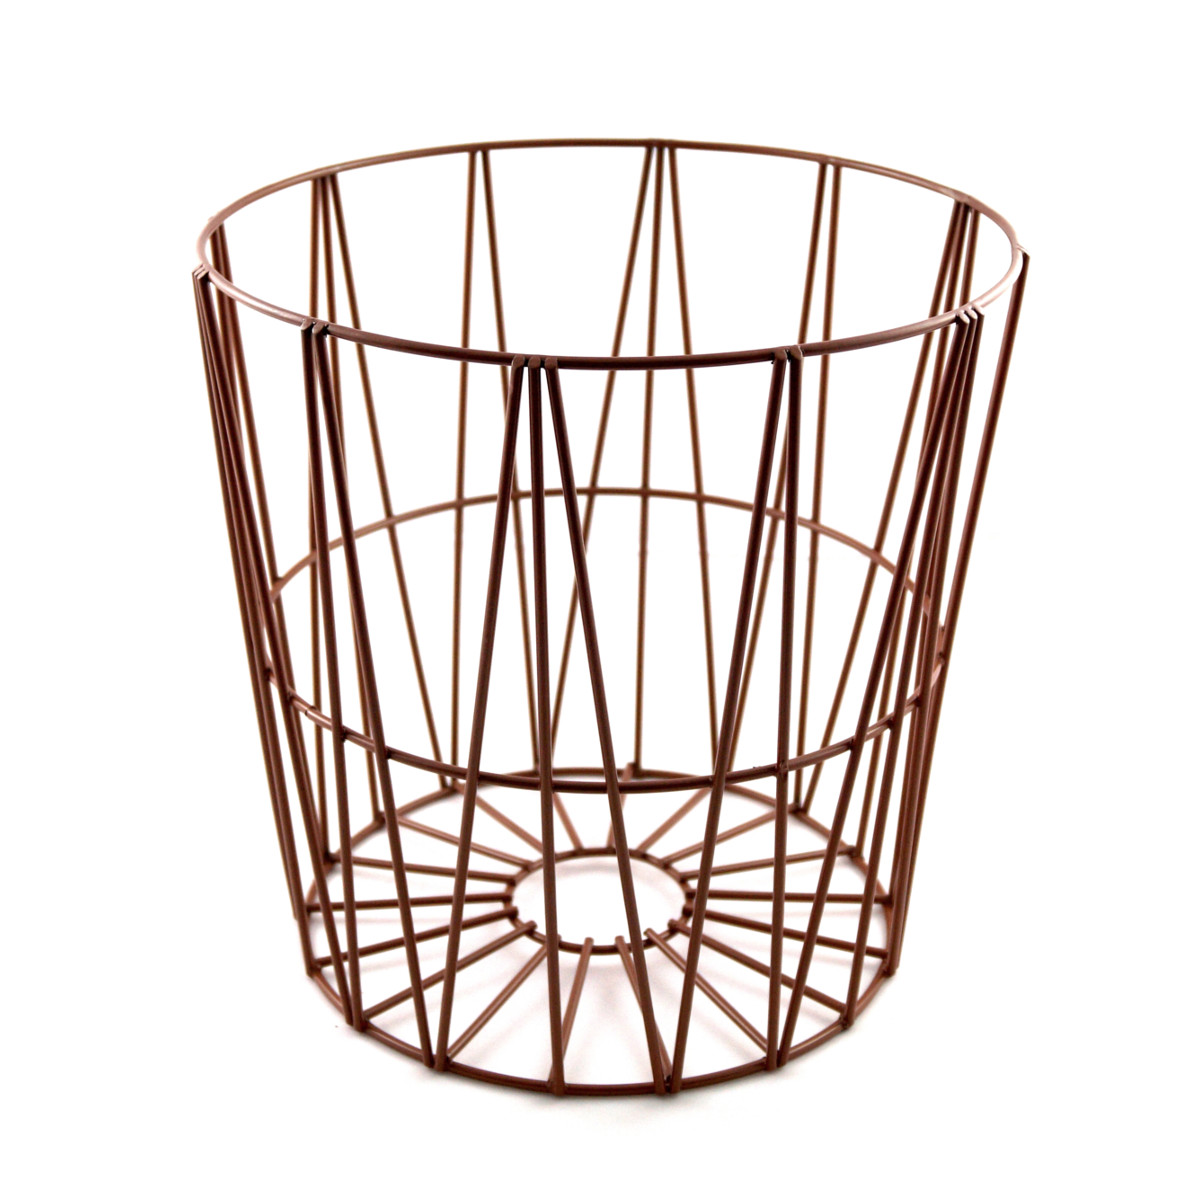 design drahtk rbe in 4 gr en drahtkorb tisch korb mit deckel braun ebay. Black Bedroom Furniture Sets. Home Design Ideas